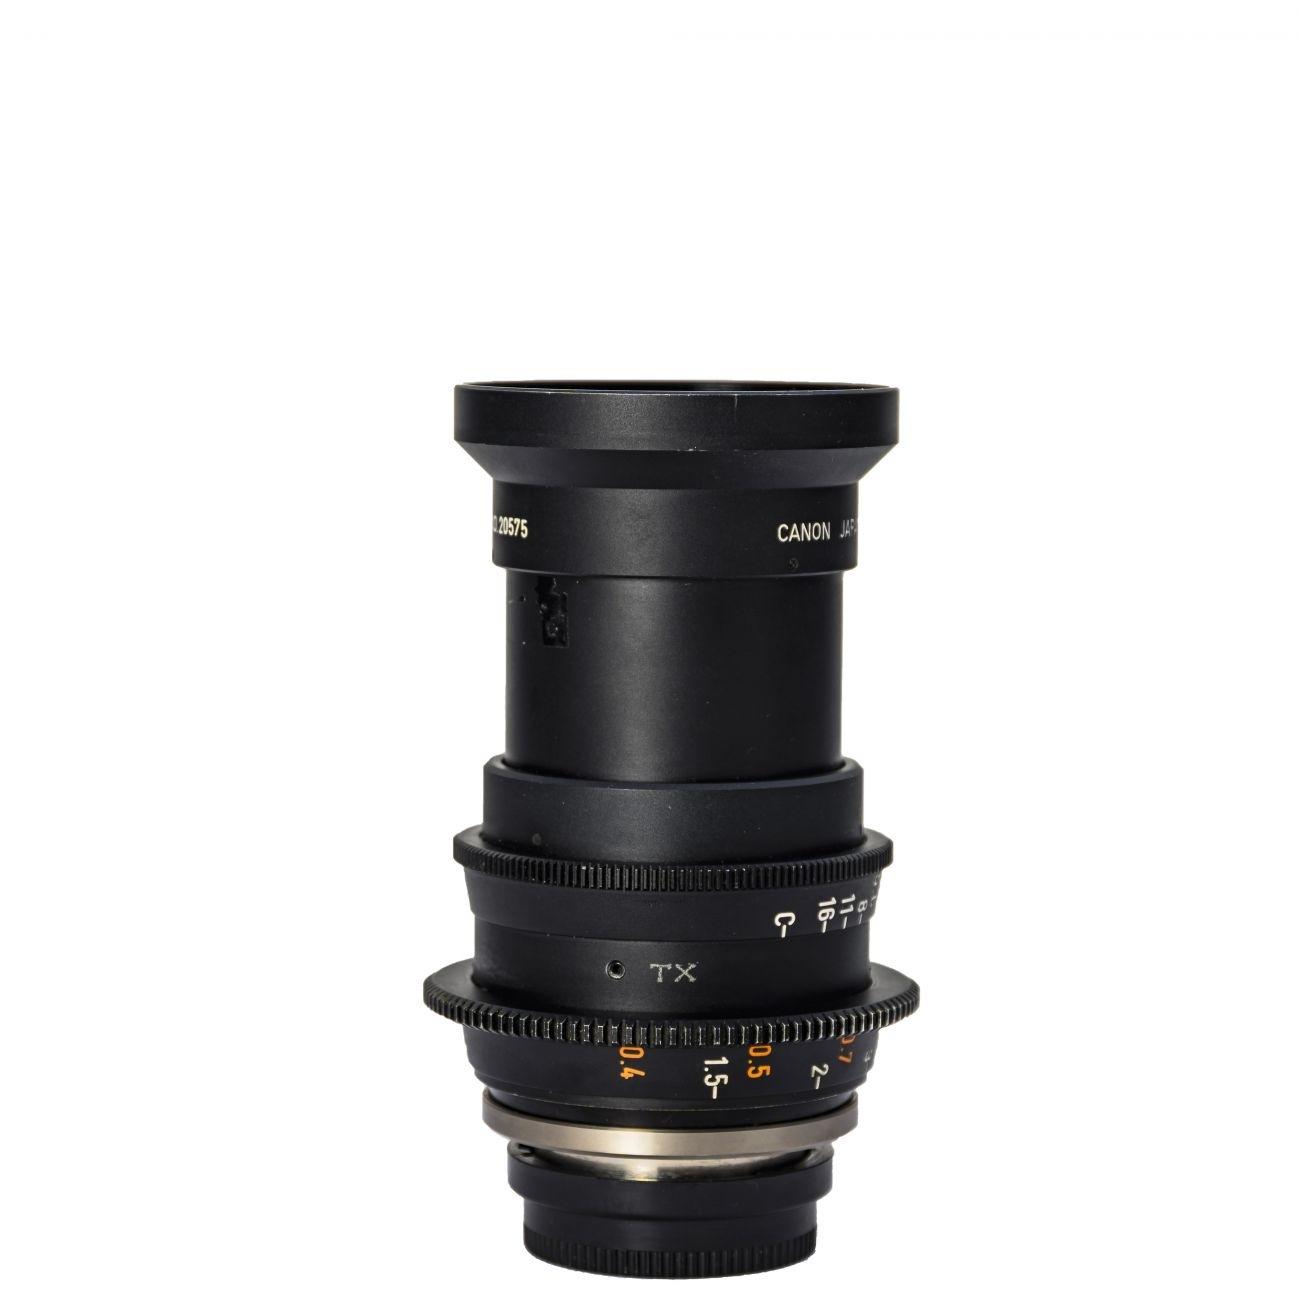 10mm lens Canon EJ T1.5 B4-mount